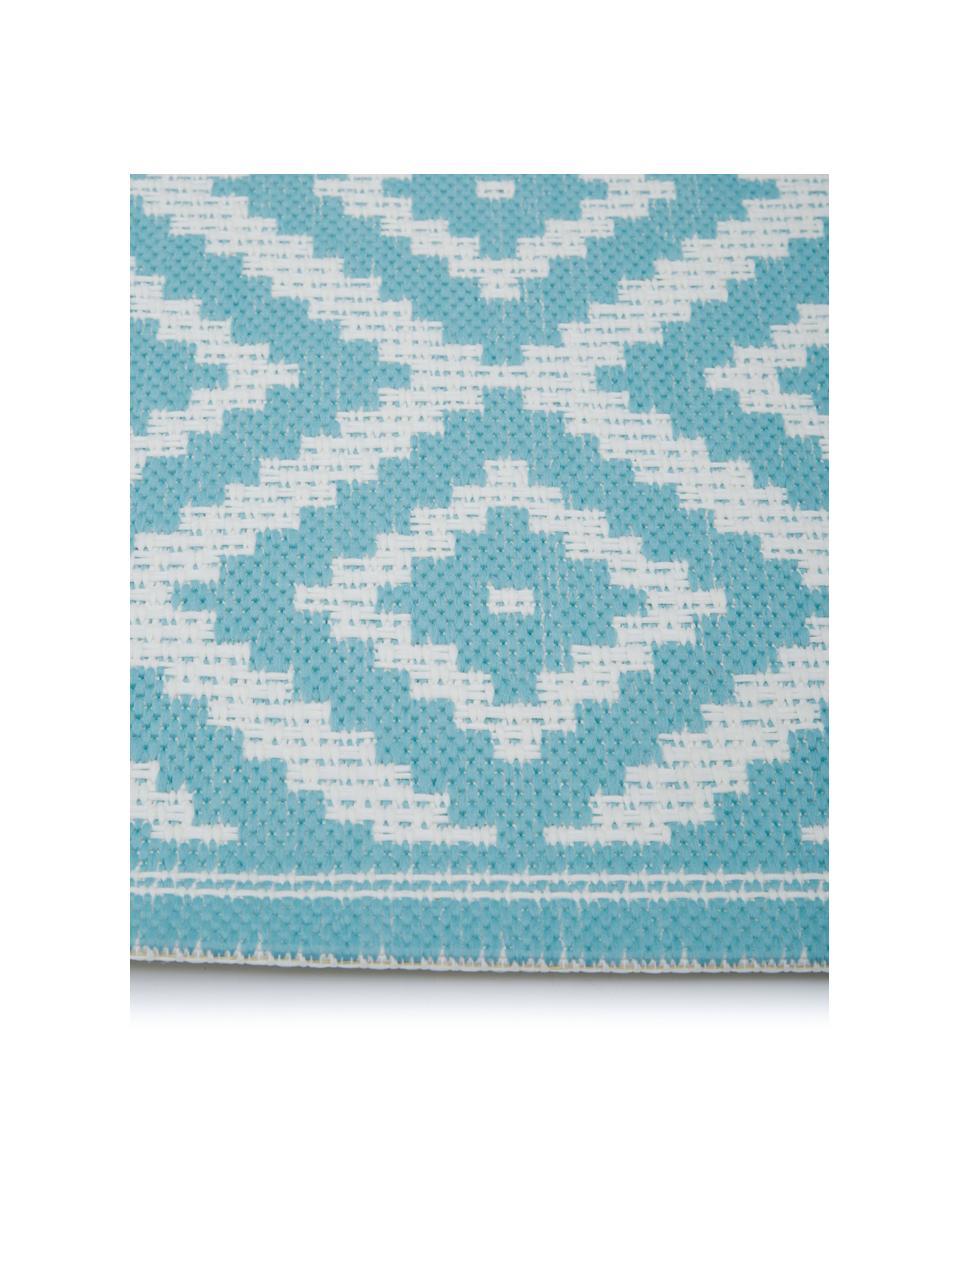 In- & outdoor vloerkleed met patroon Miami in turquoise/wit, 86% polypropyleen, 14% polyester, Wit, turquoise, B 200 x L 290 cm (maat L)